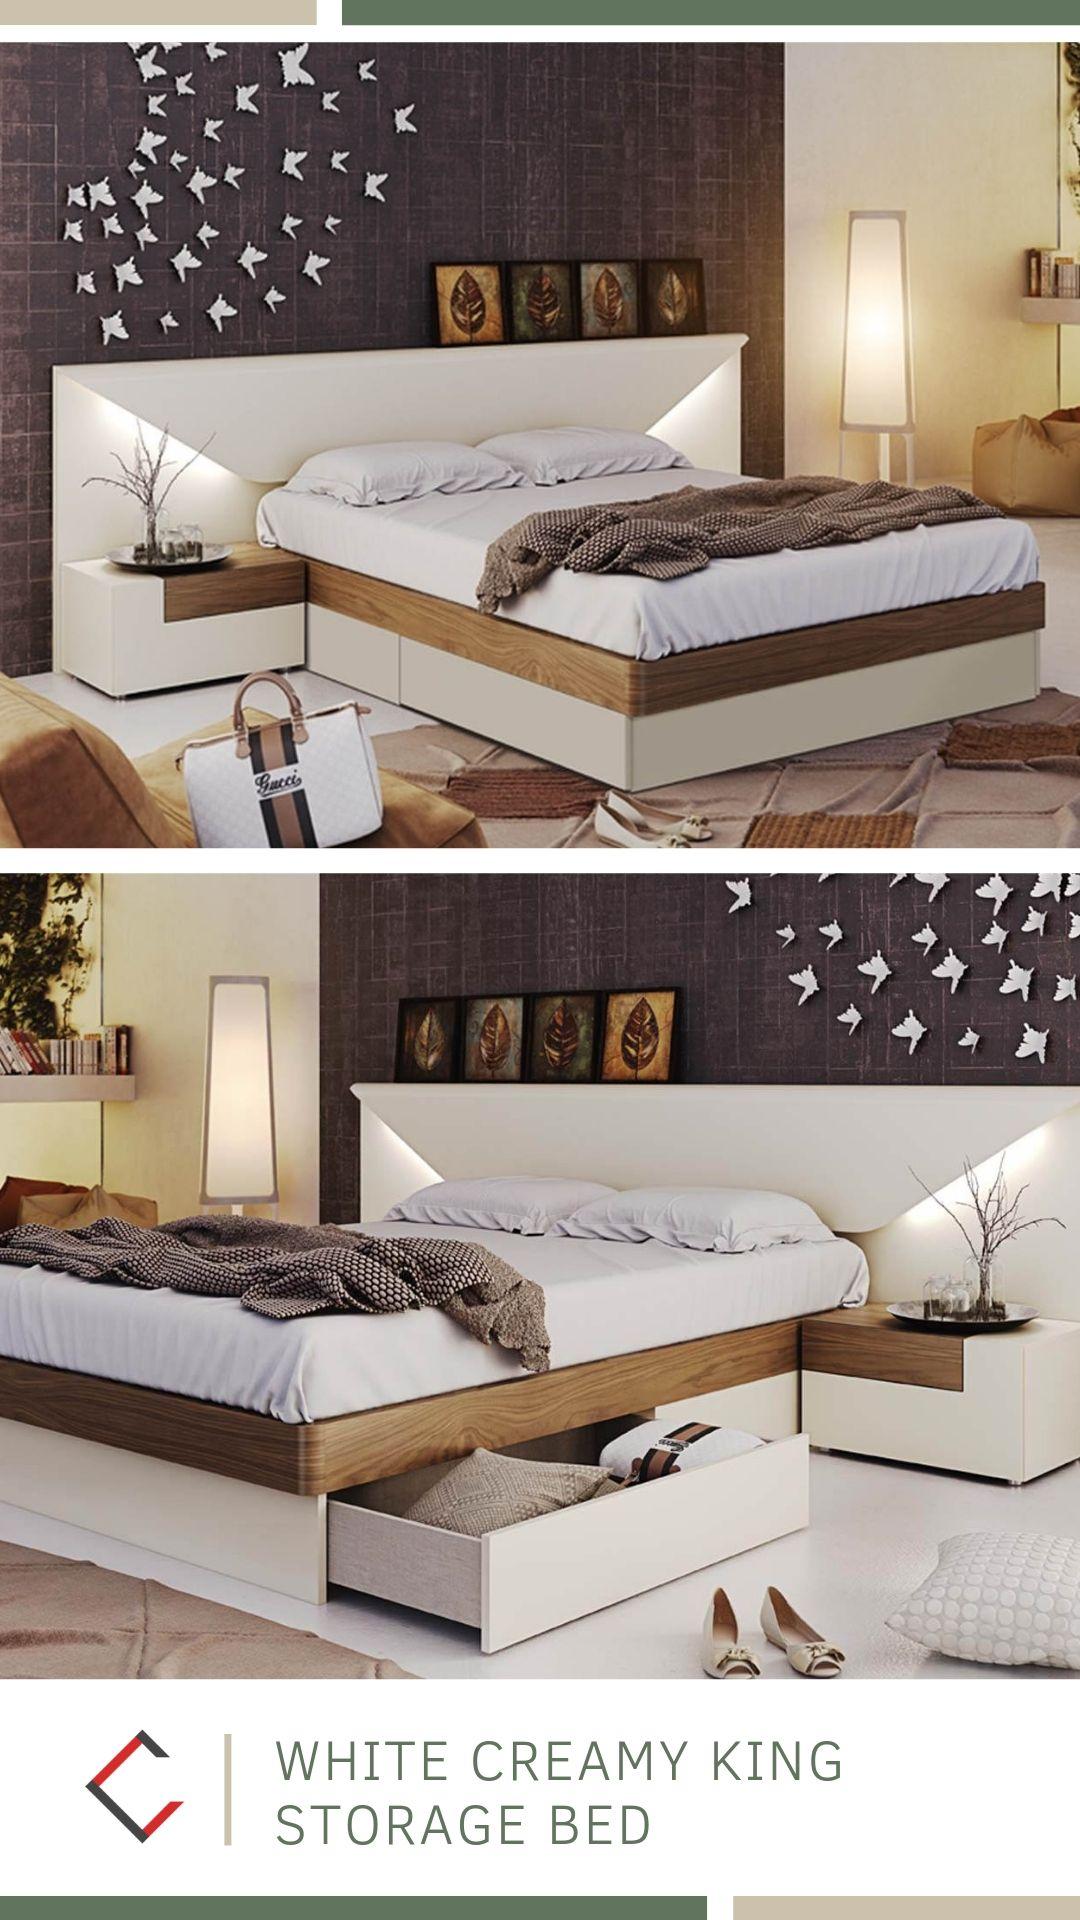 Esf Garcia Sabate Spain Elena Off White Creamy King Storage Bed In